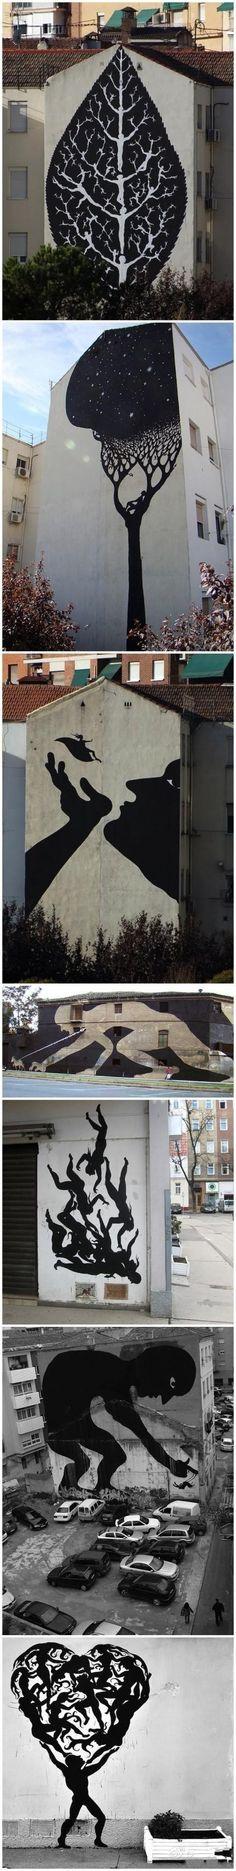 street artworks